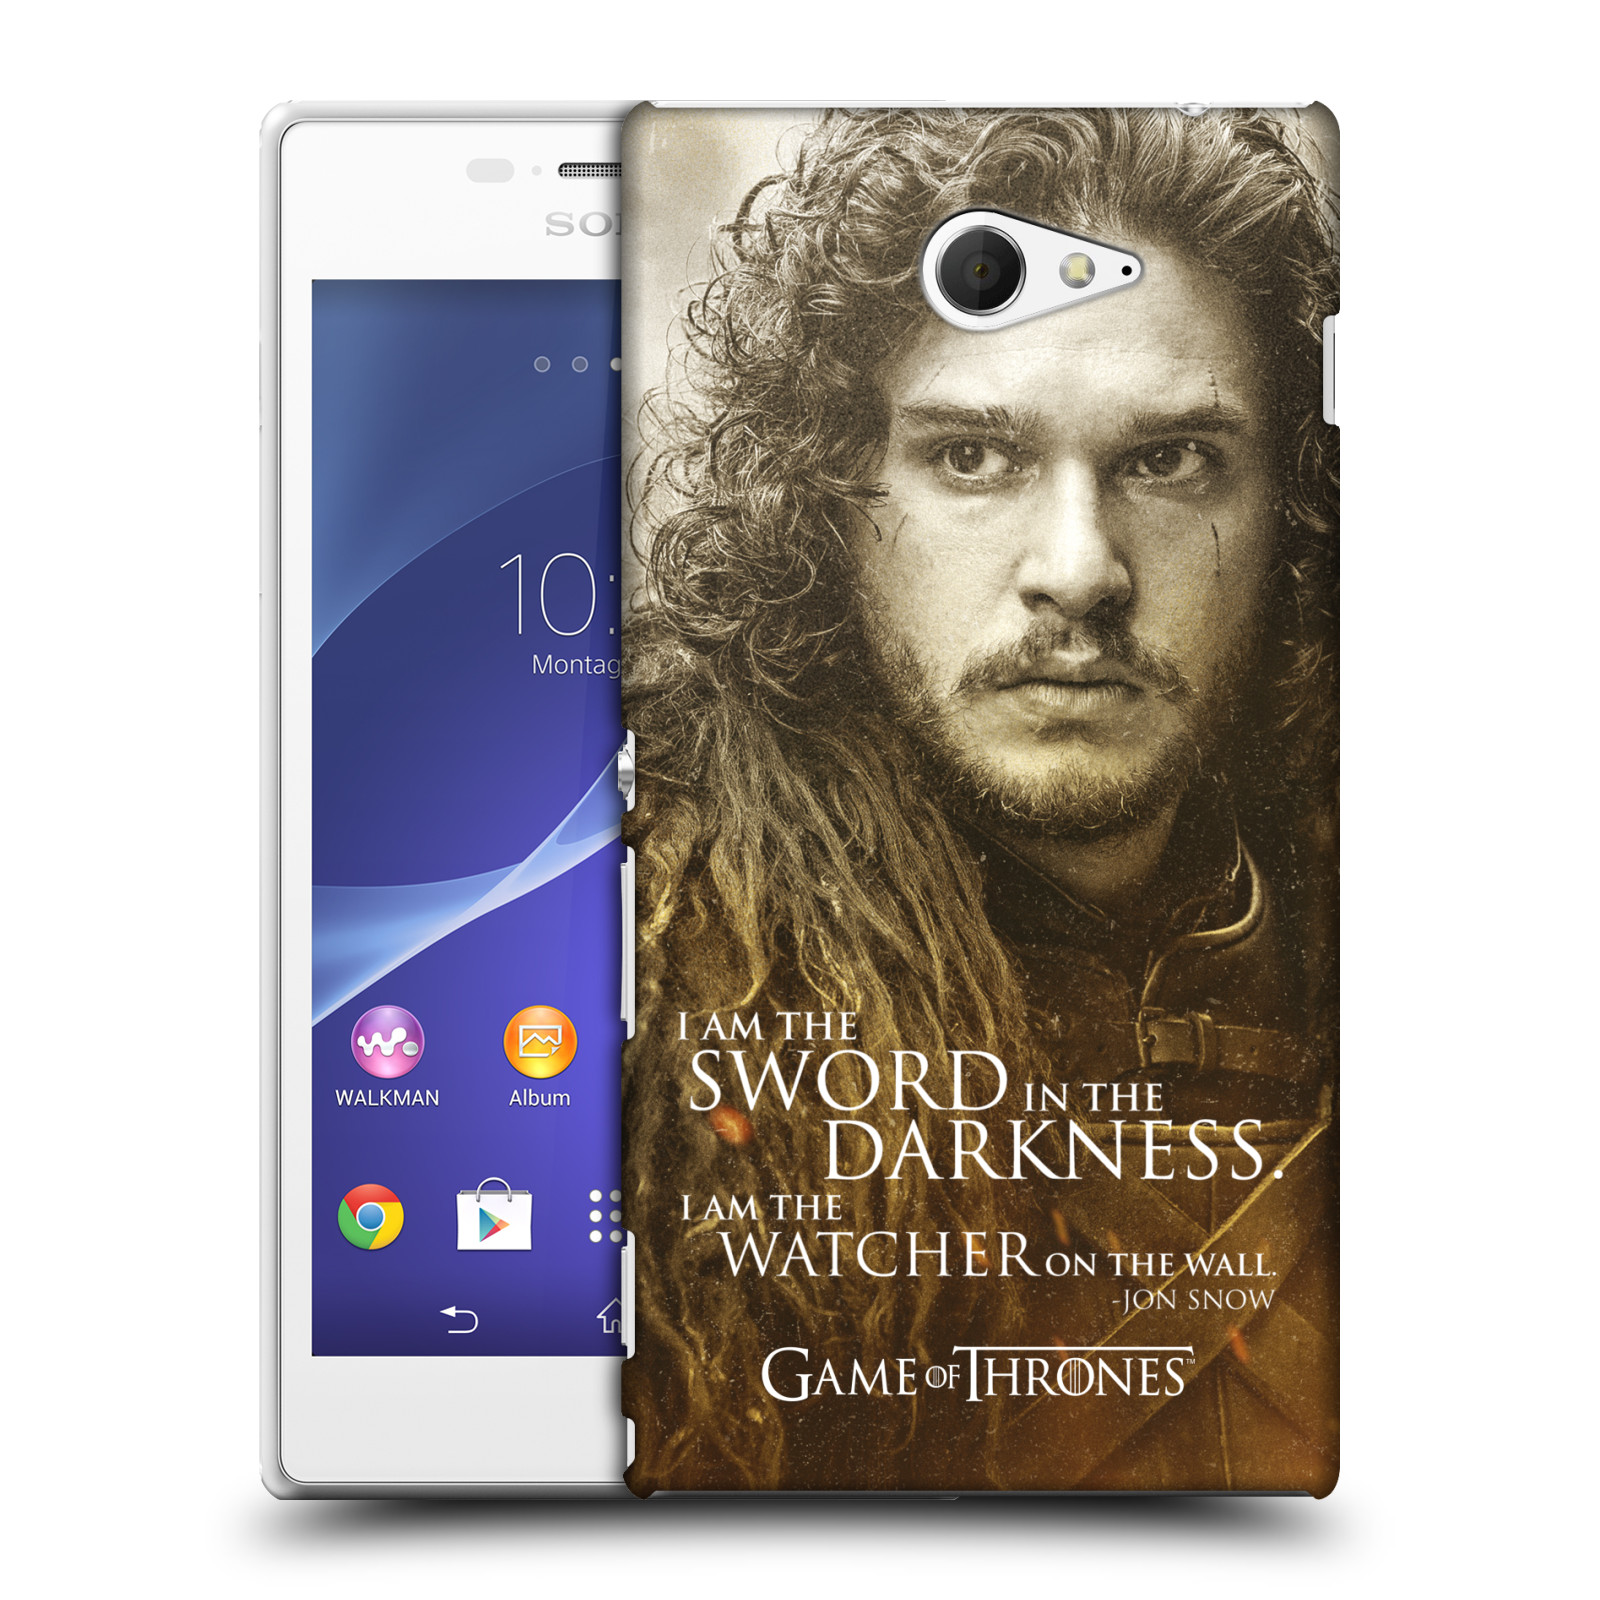 Plastové pouzdro na mobil Sony Xperia M2 D2303 HEAD CASE Hra o trůny - Jon Snow (Plastový kryt či obal na mobilní telefon s licencovaným motivem Hra o trůny - Game Of Thrones pro Sony Xperia M2 )